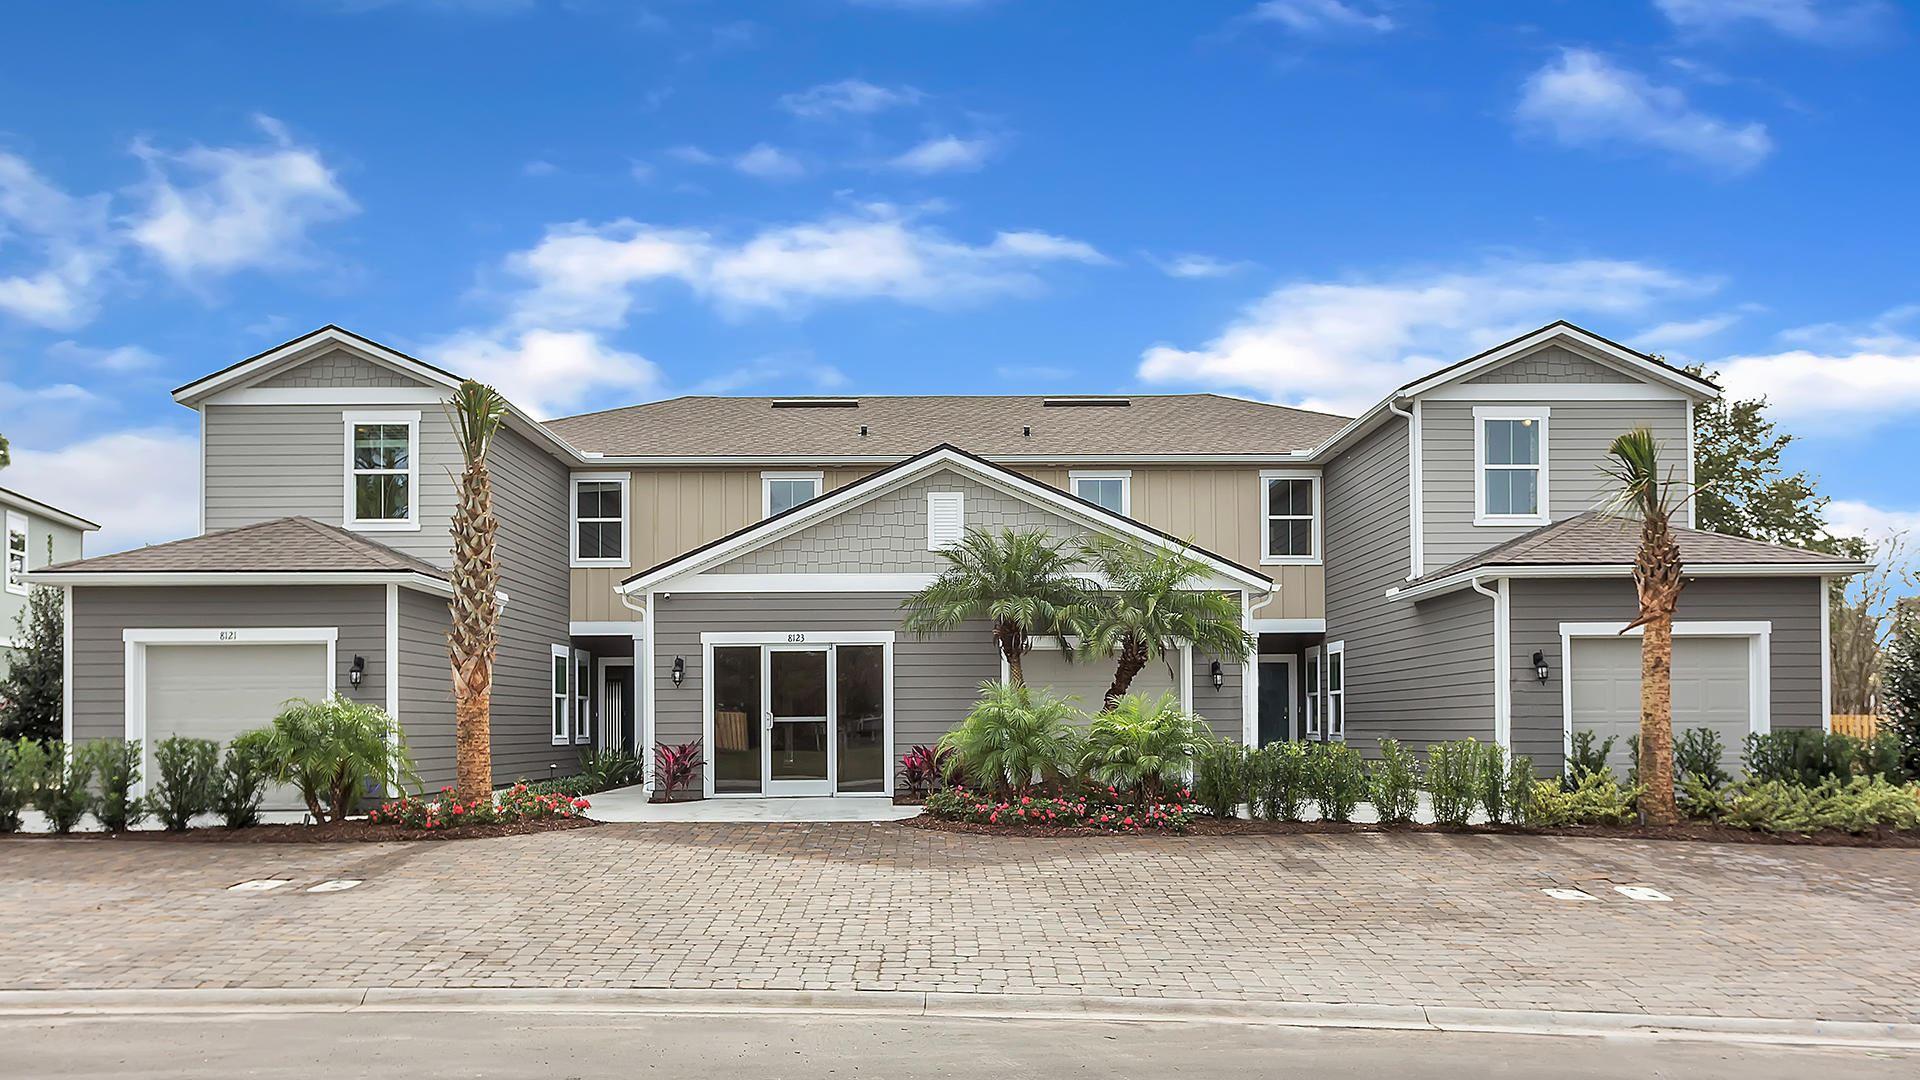 7705 LEGACY TRL #Lot No: 164, Jacksonville, FL 32256 - MLS#: 1098970